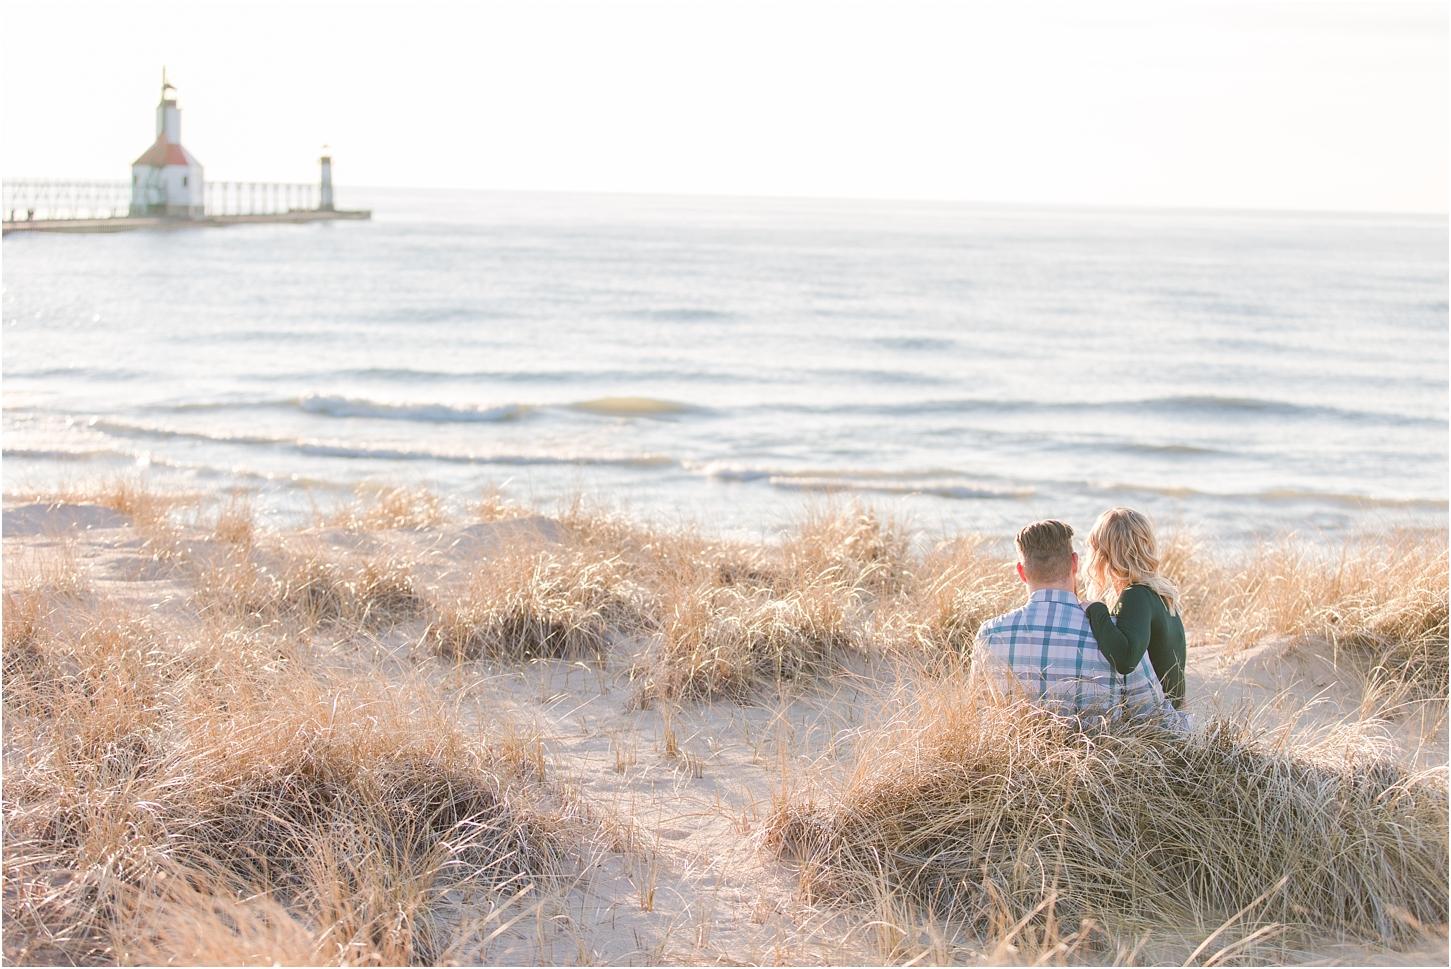 romantic-sunset-beach-engagement-photos-at-silver-beach-in-saint-joseph-mi-by-courtney-carolyn-photography_0025.jpg